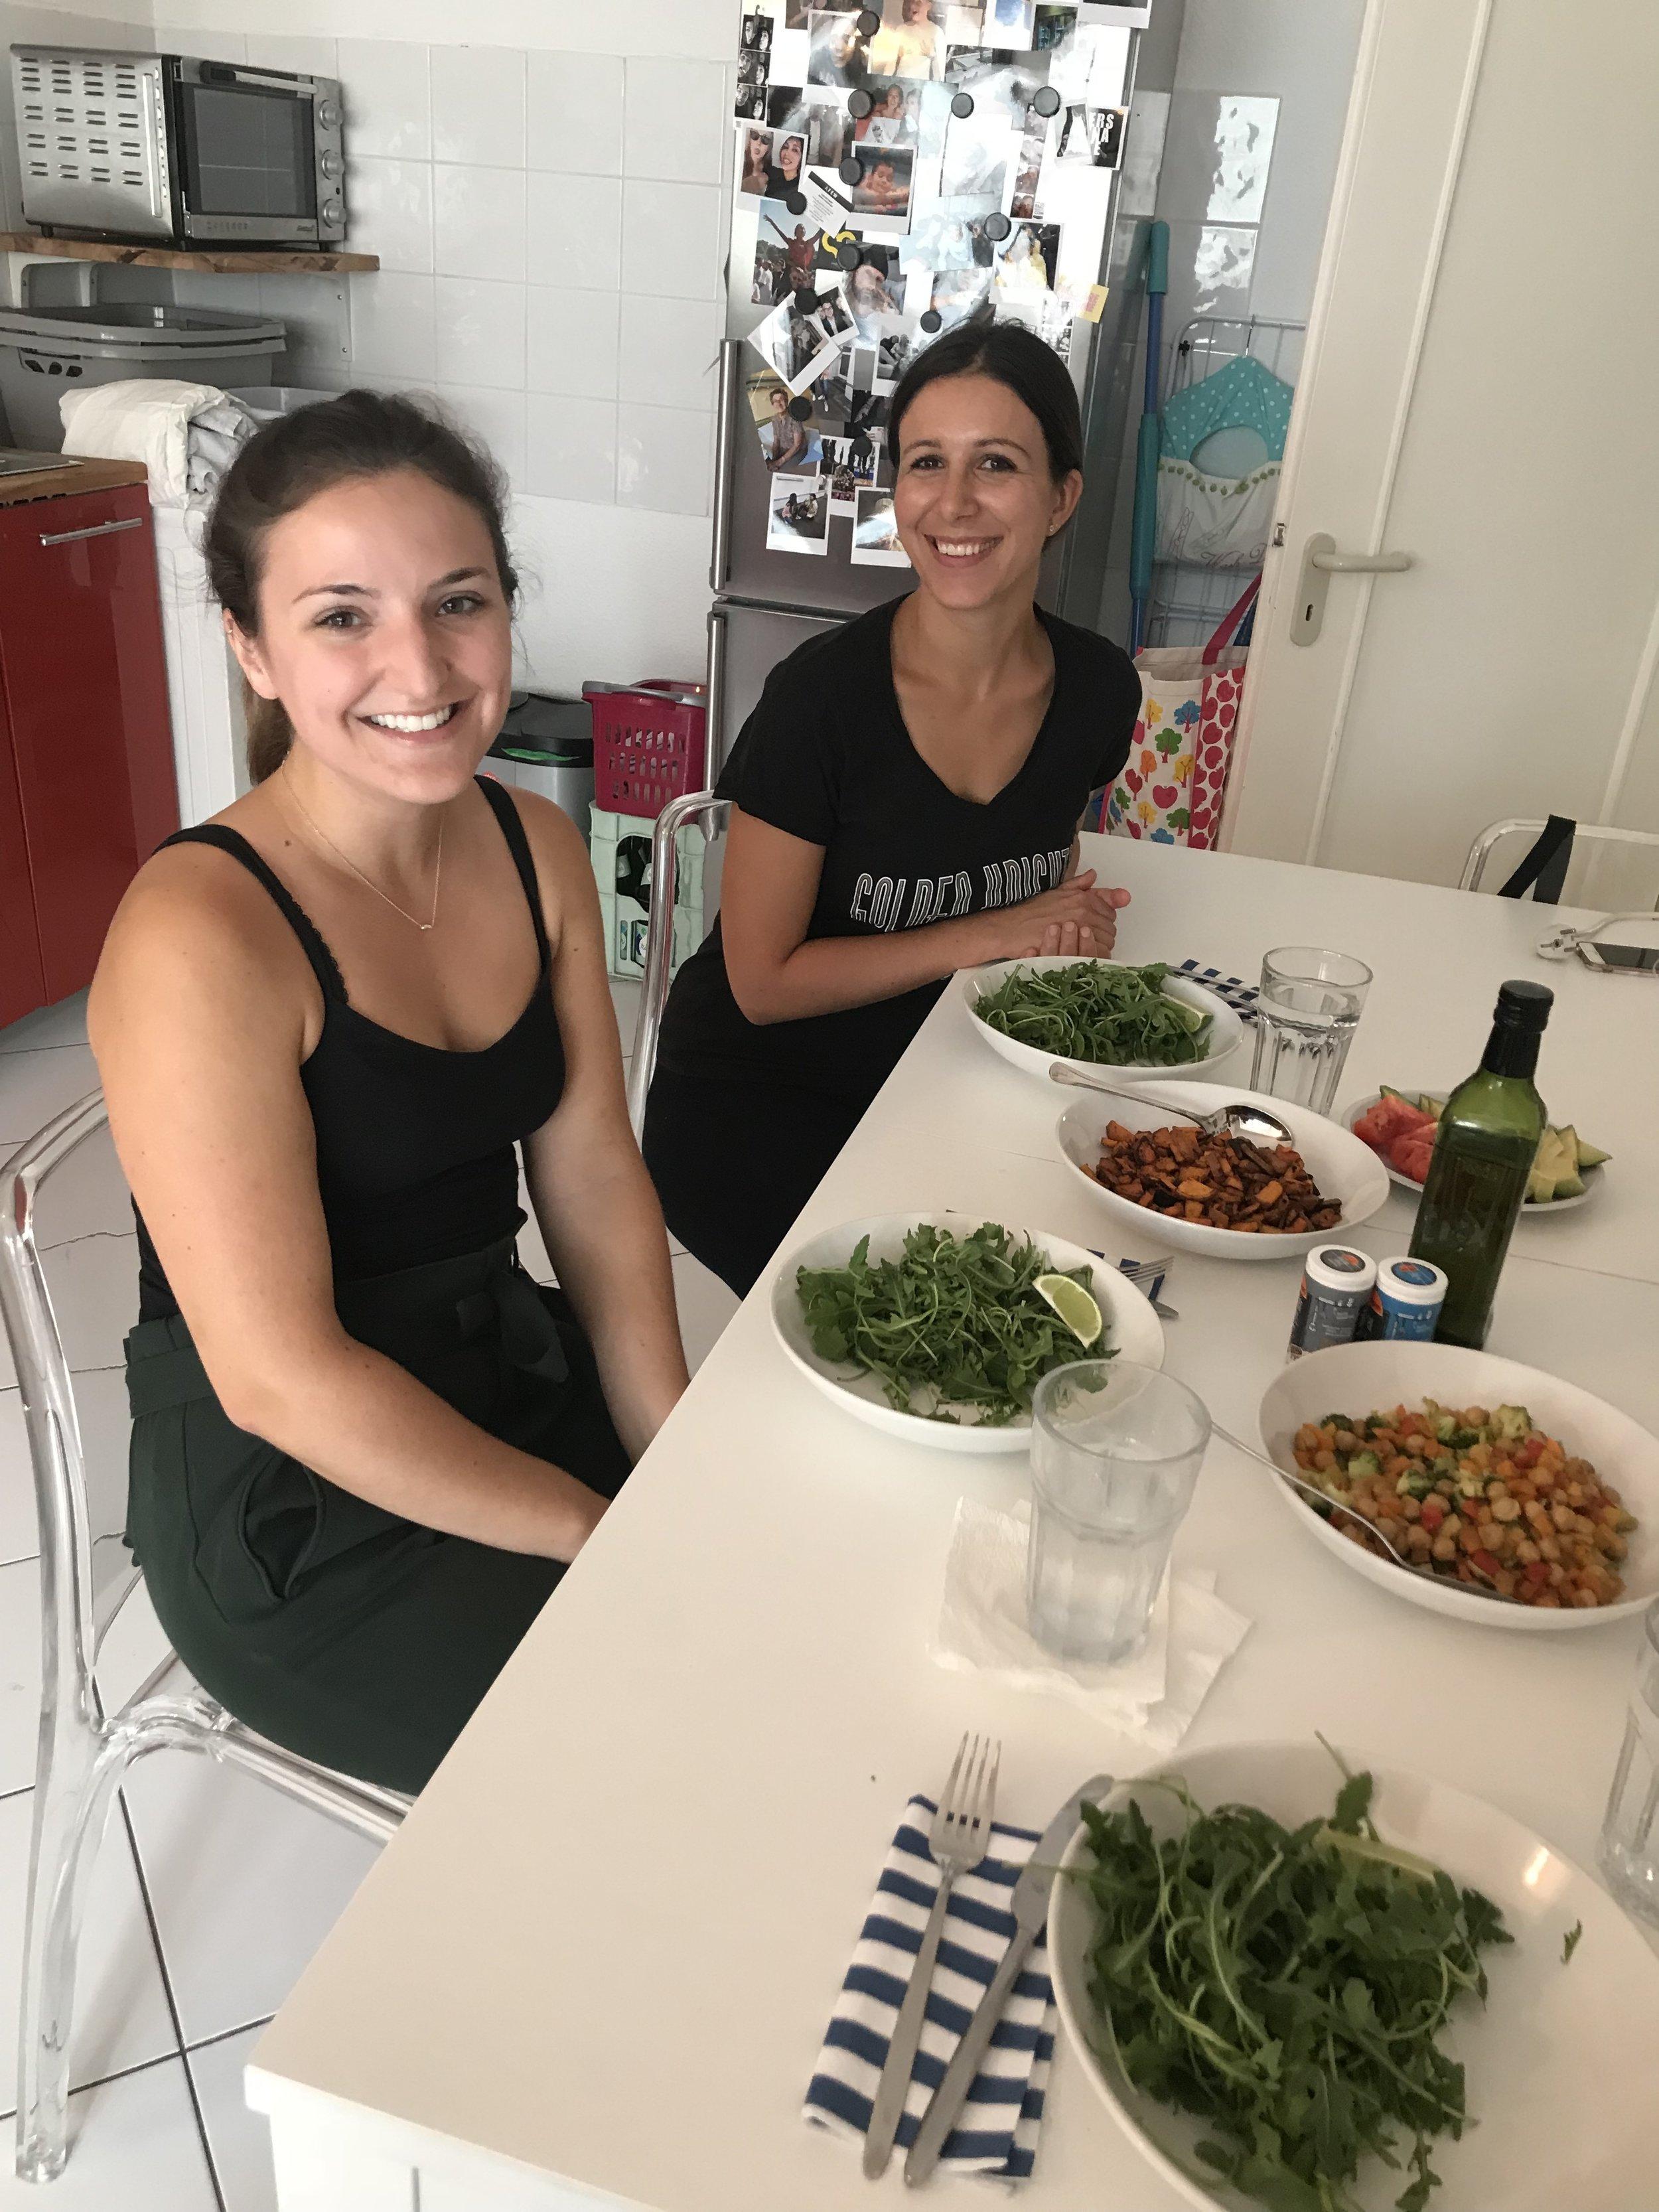 Lovely dinner dates with Caitlin & Dilan!